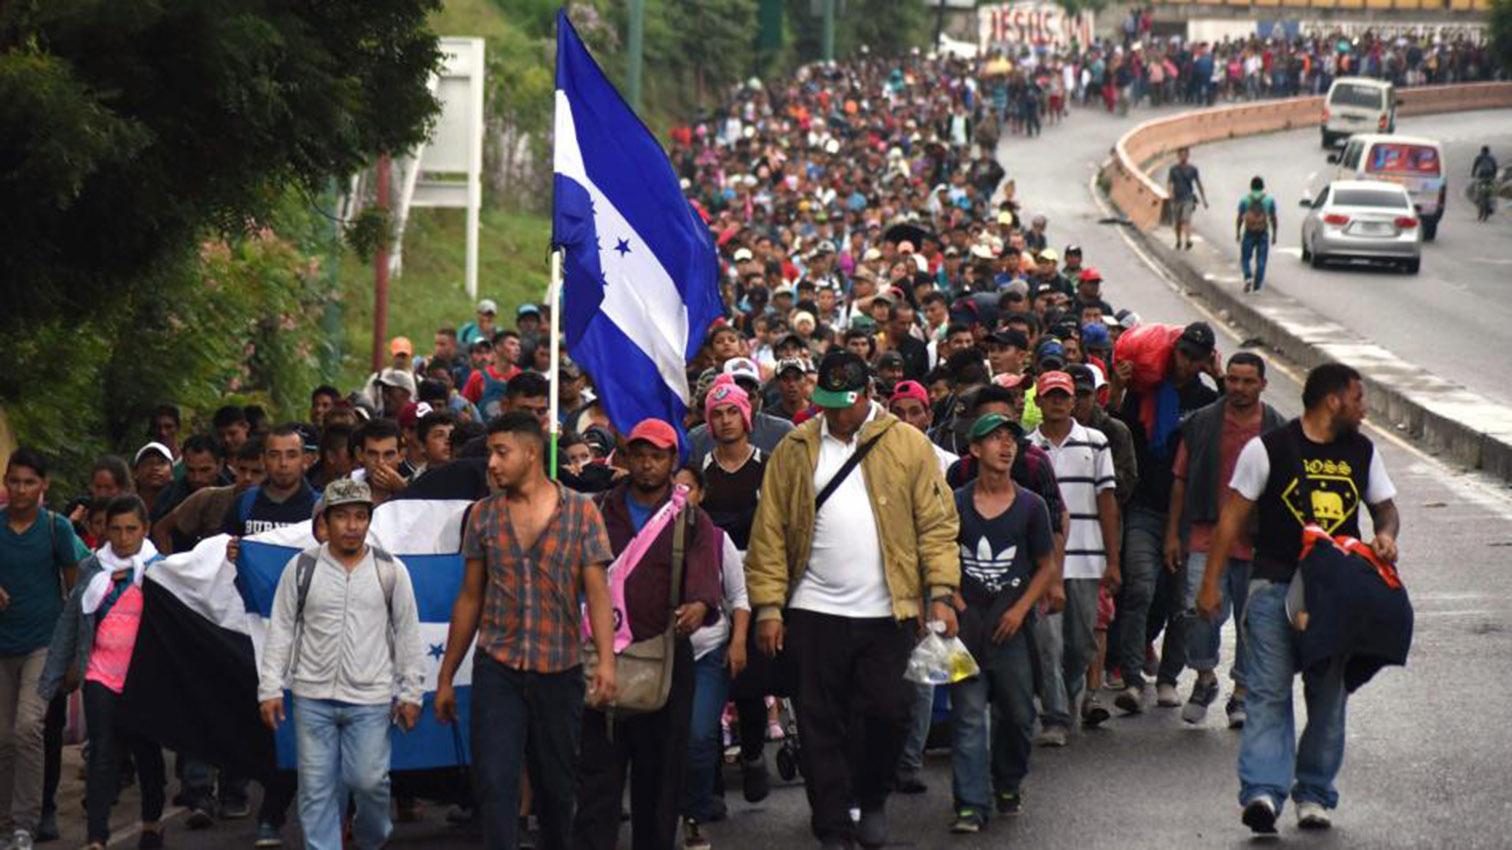 na iglesia de EEUU acepta a familia hondureña que viajó en caravana migrante